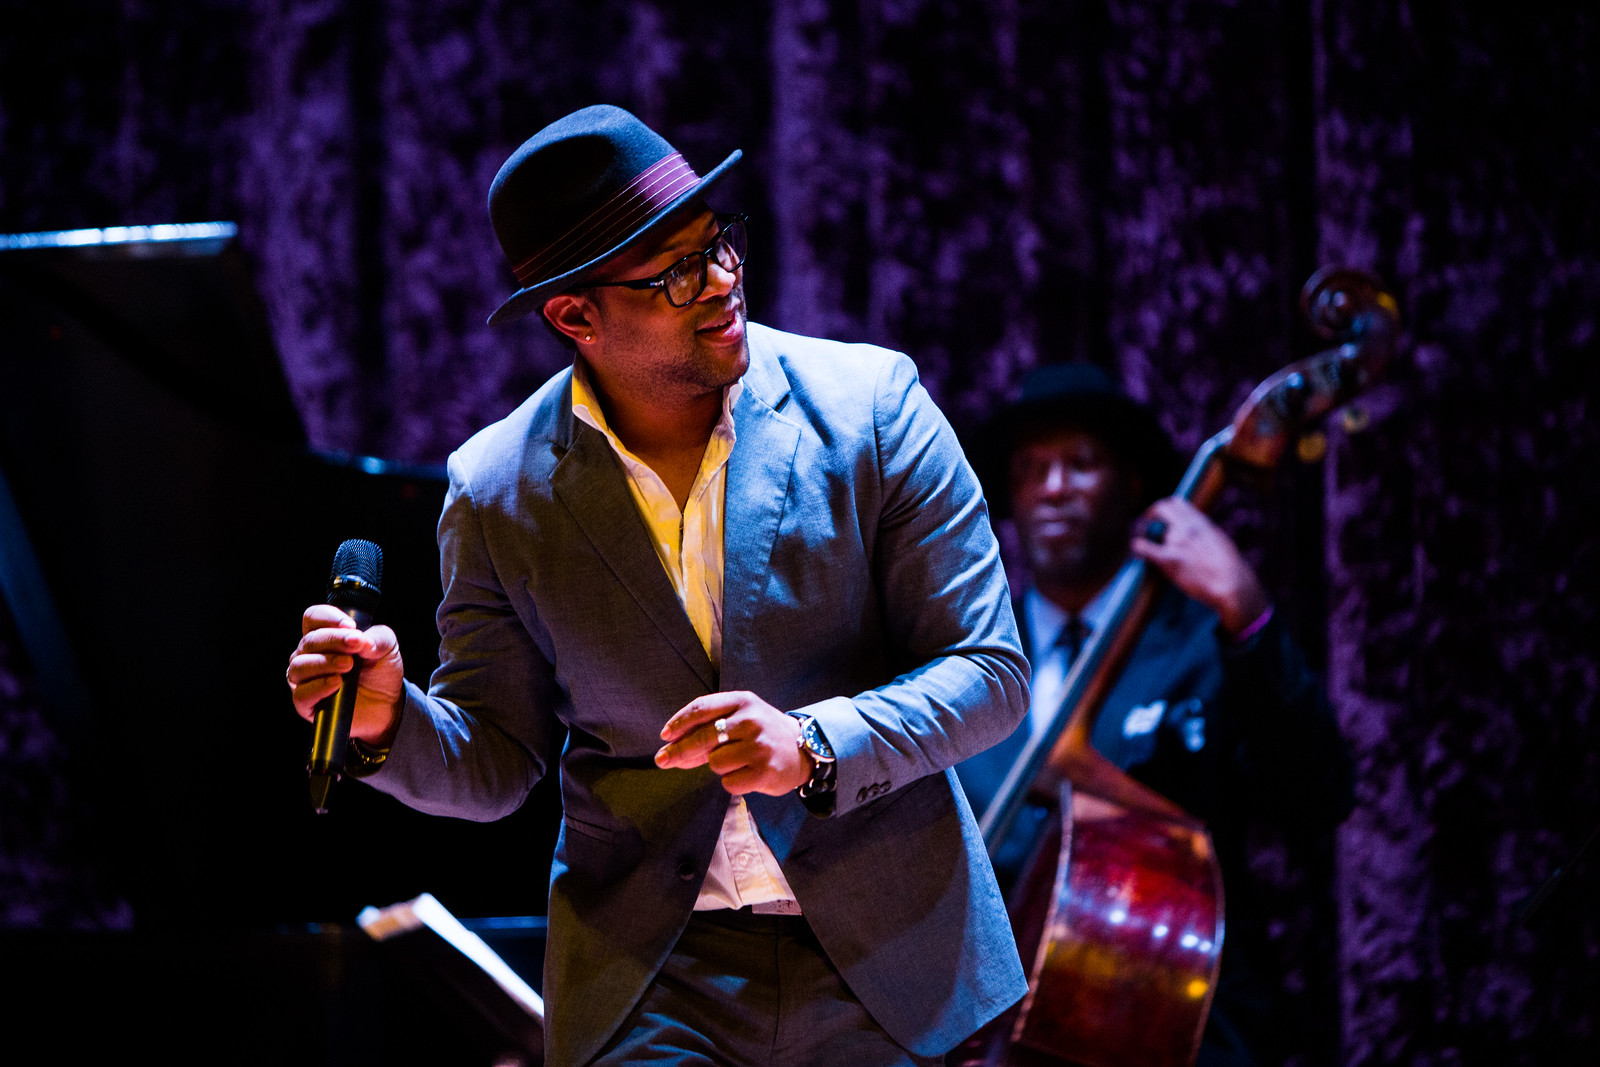 Living-Jazz-MLK-Tribute-2017-Oakland-by-Rosaura-Studios-60-X3.jpg